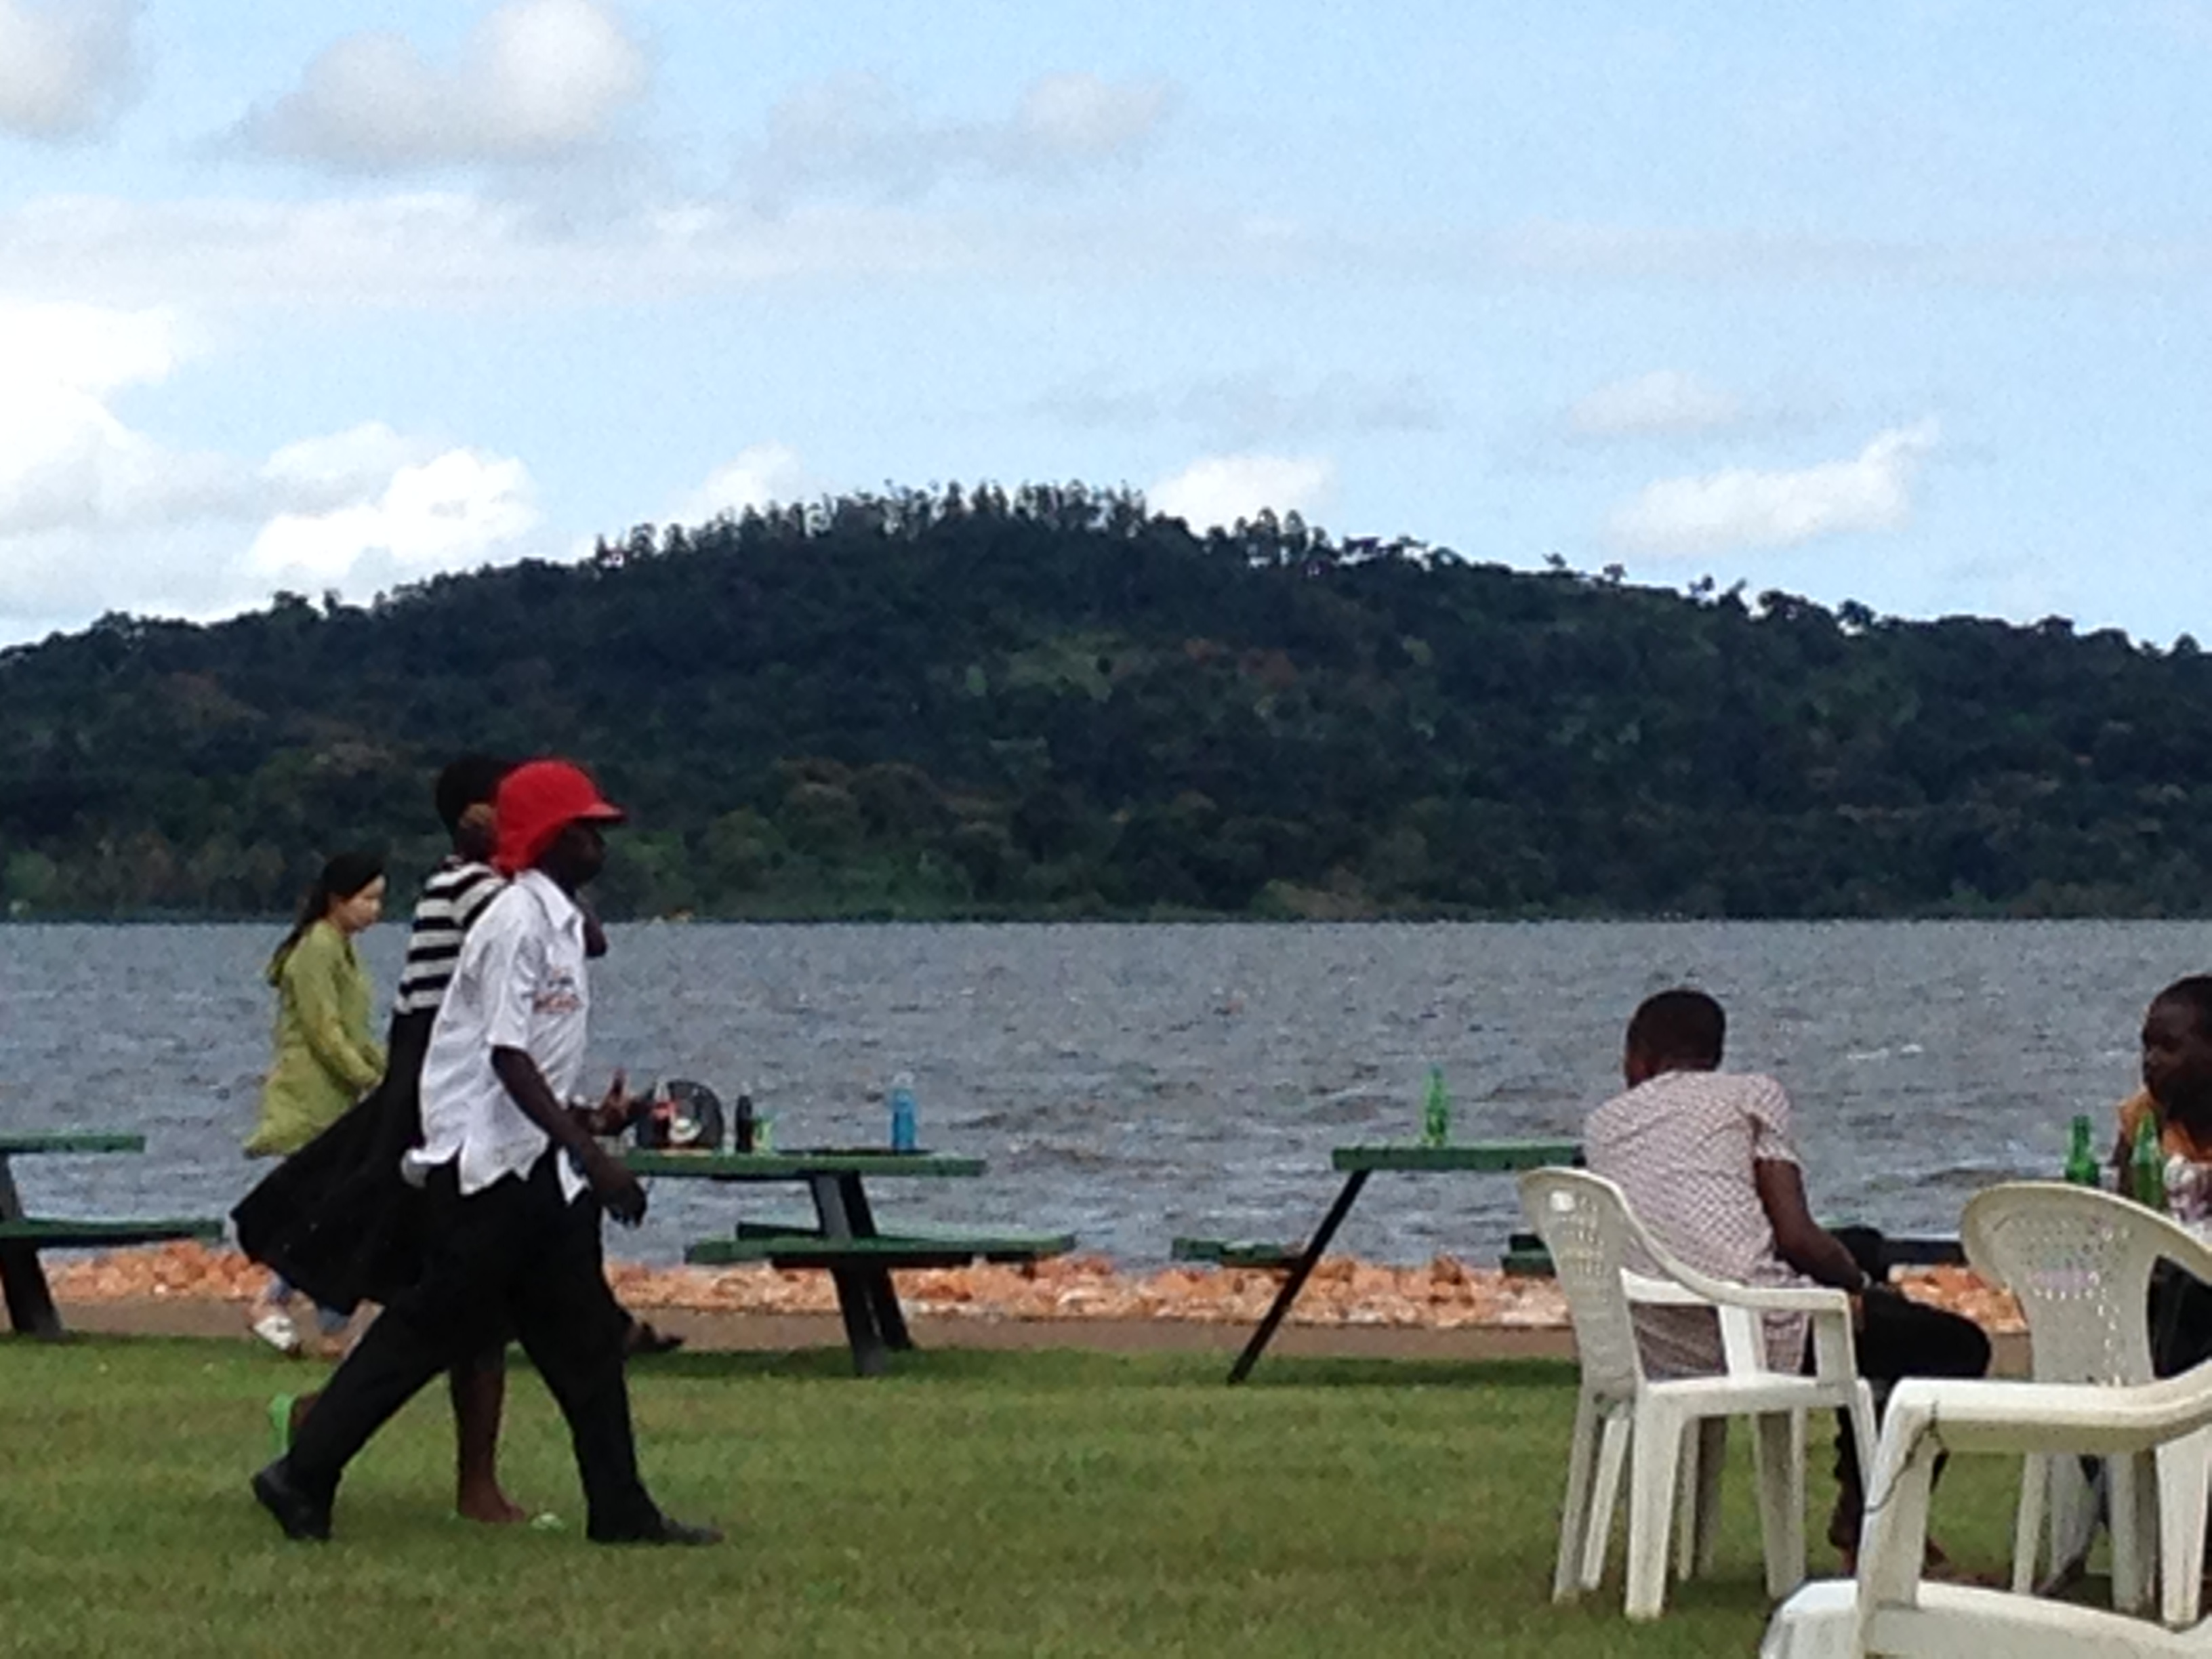 1 Day Fishing Tour Uganda with Katona Tours in Lake Victoria